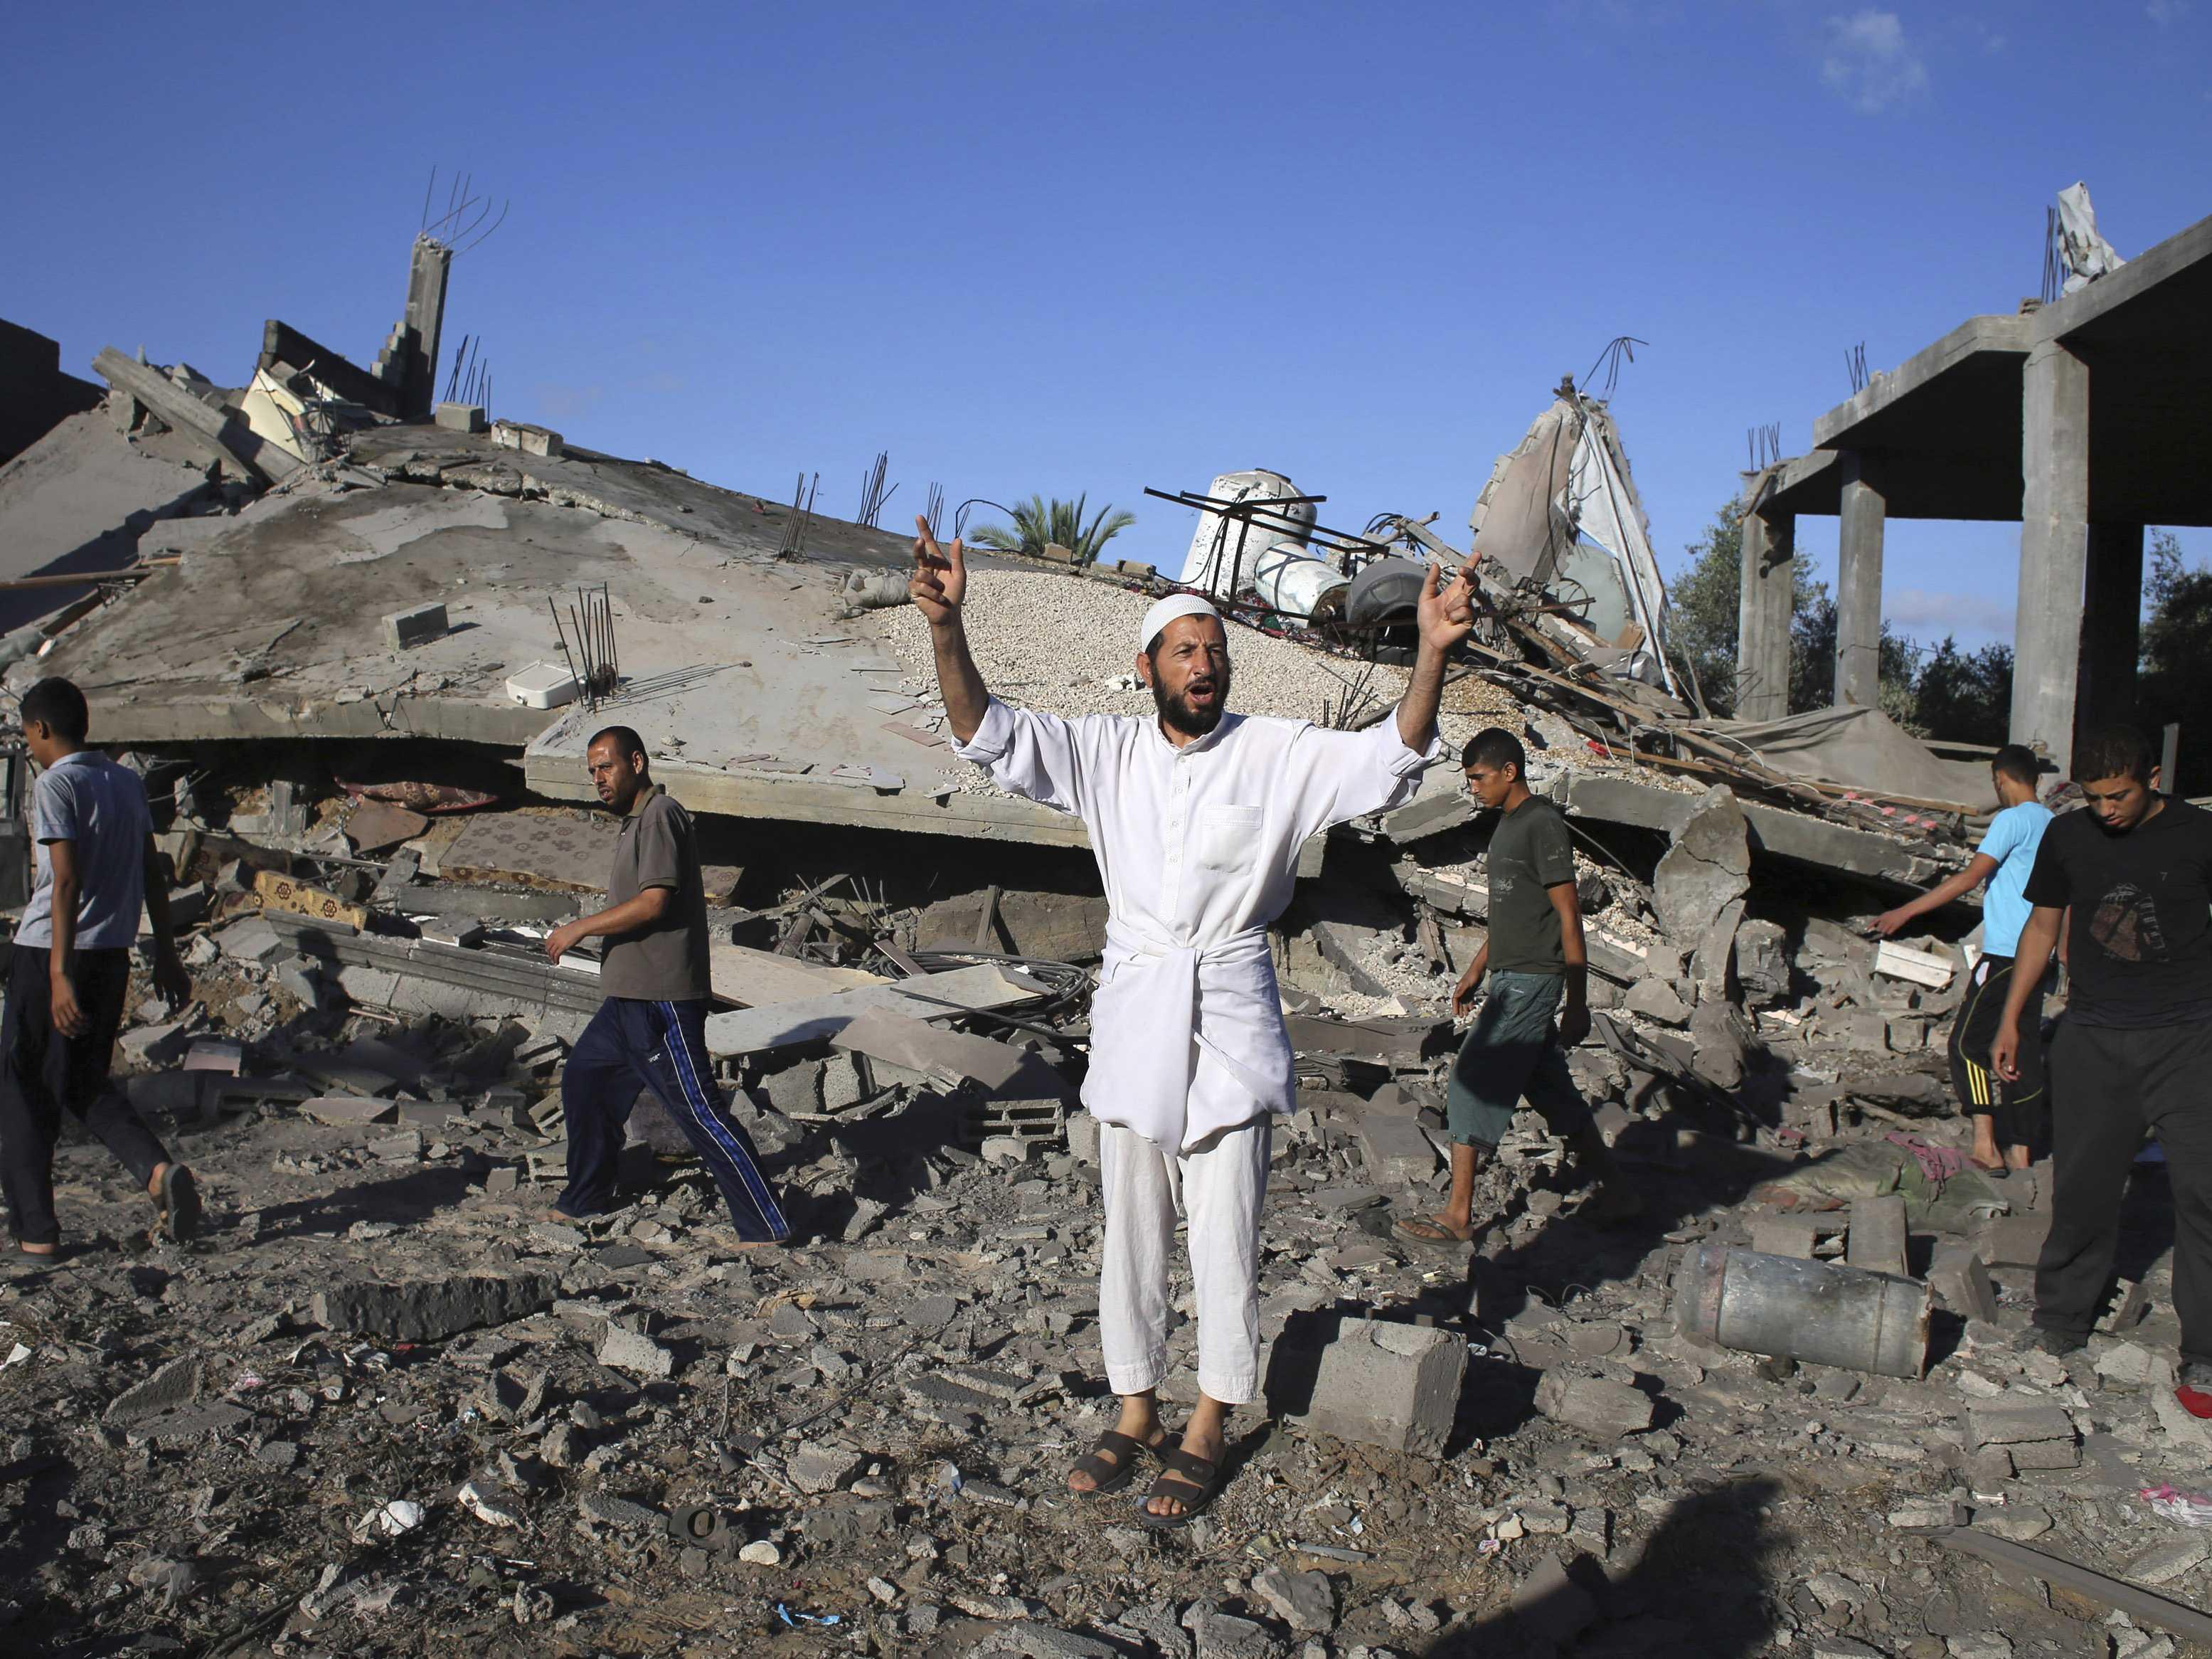 most-gaza-civilians-reject-hamas-policies-while-facing-israeli-bombs